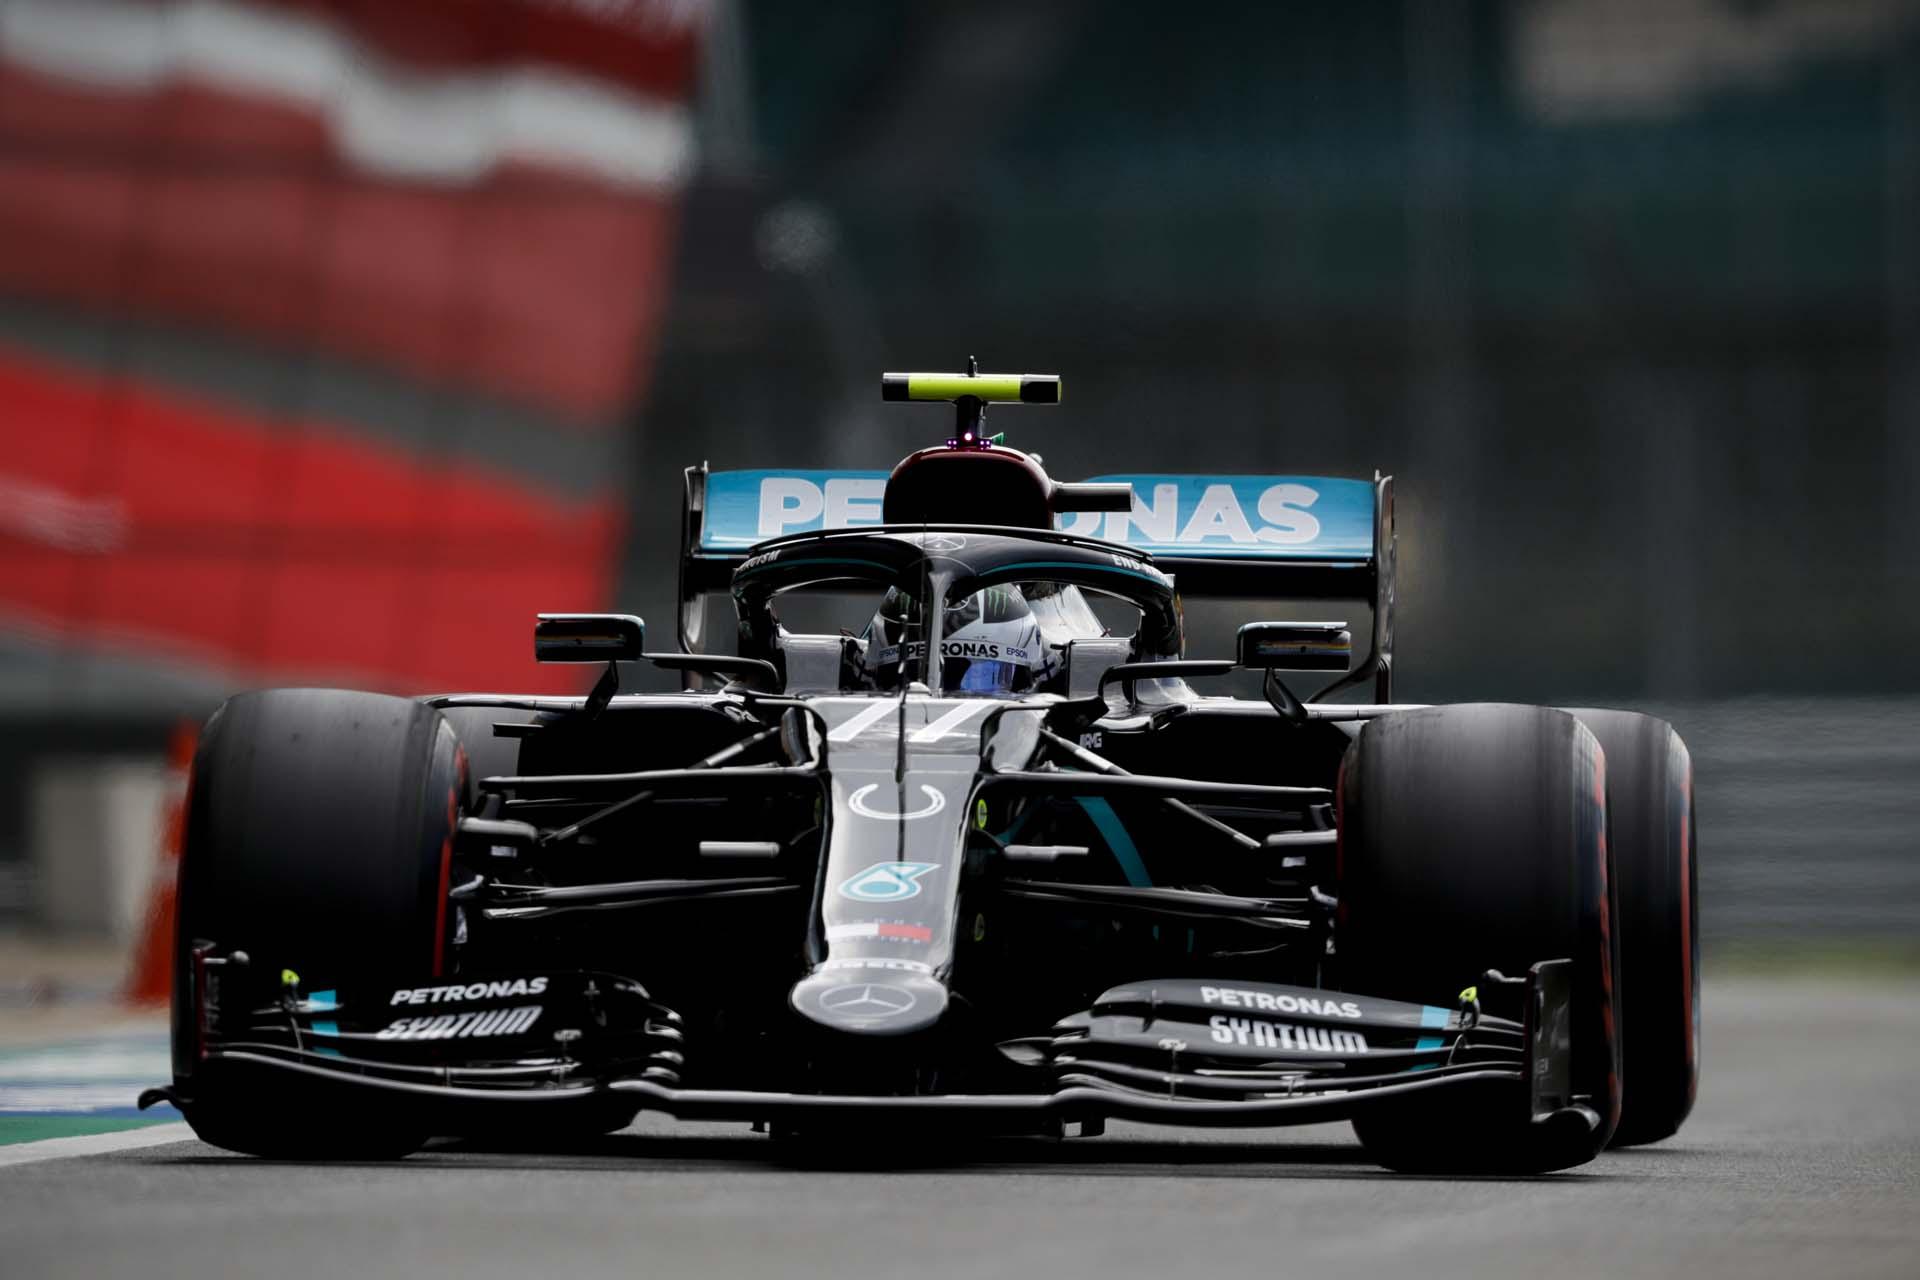 2020 70th Anniversary Grand Prix, Saturday - LAT Images